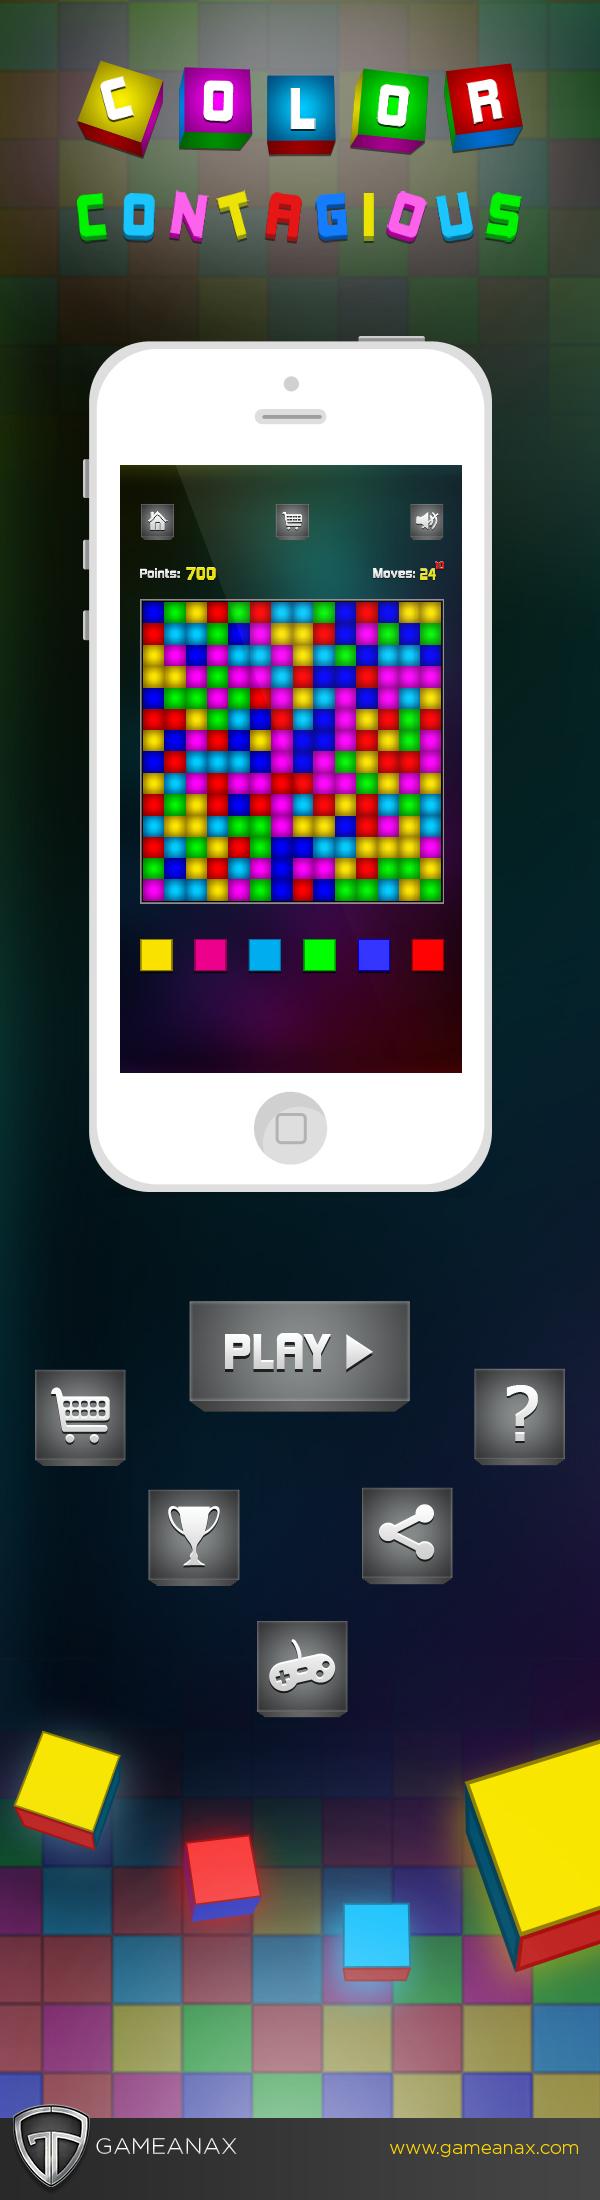 mobile gaming Gaming game iphone iPad